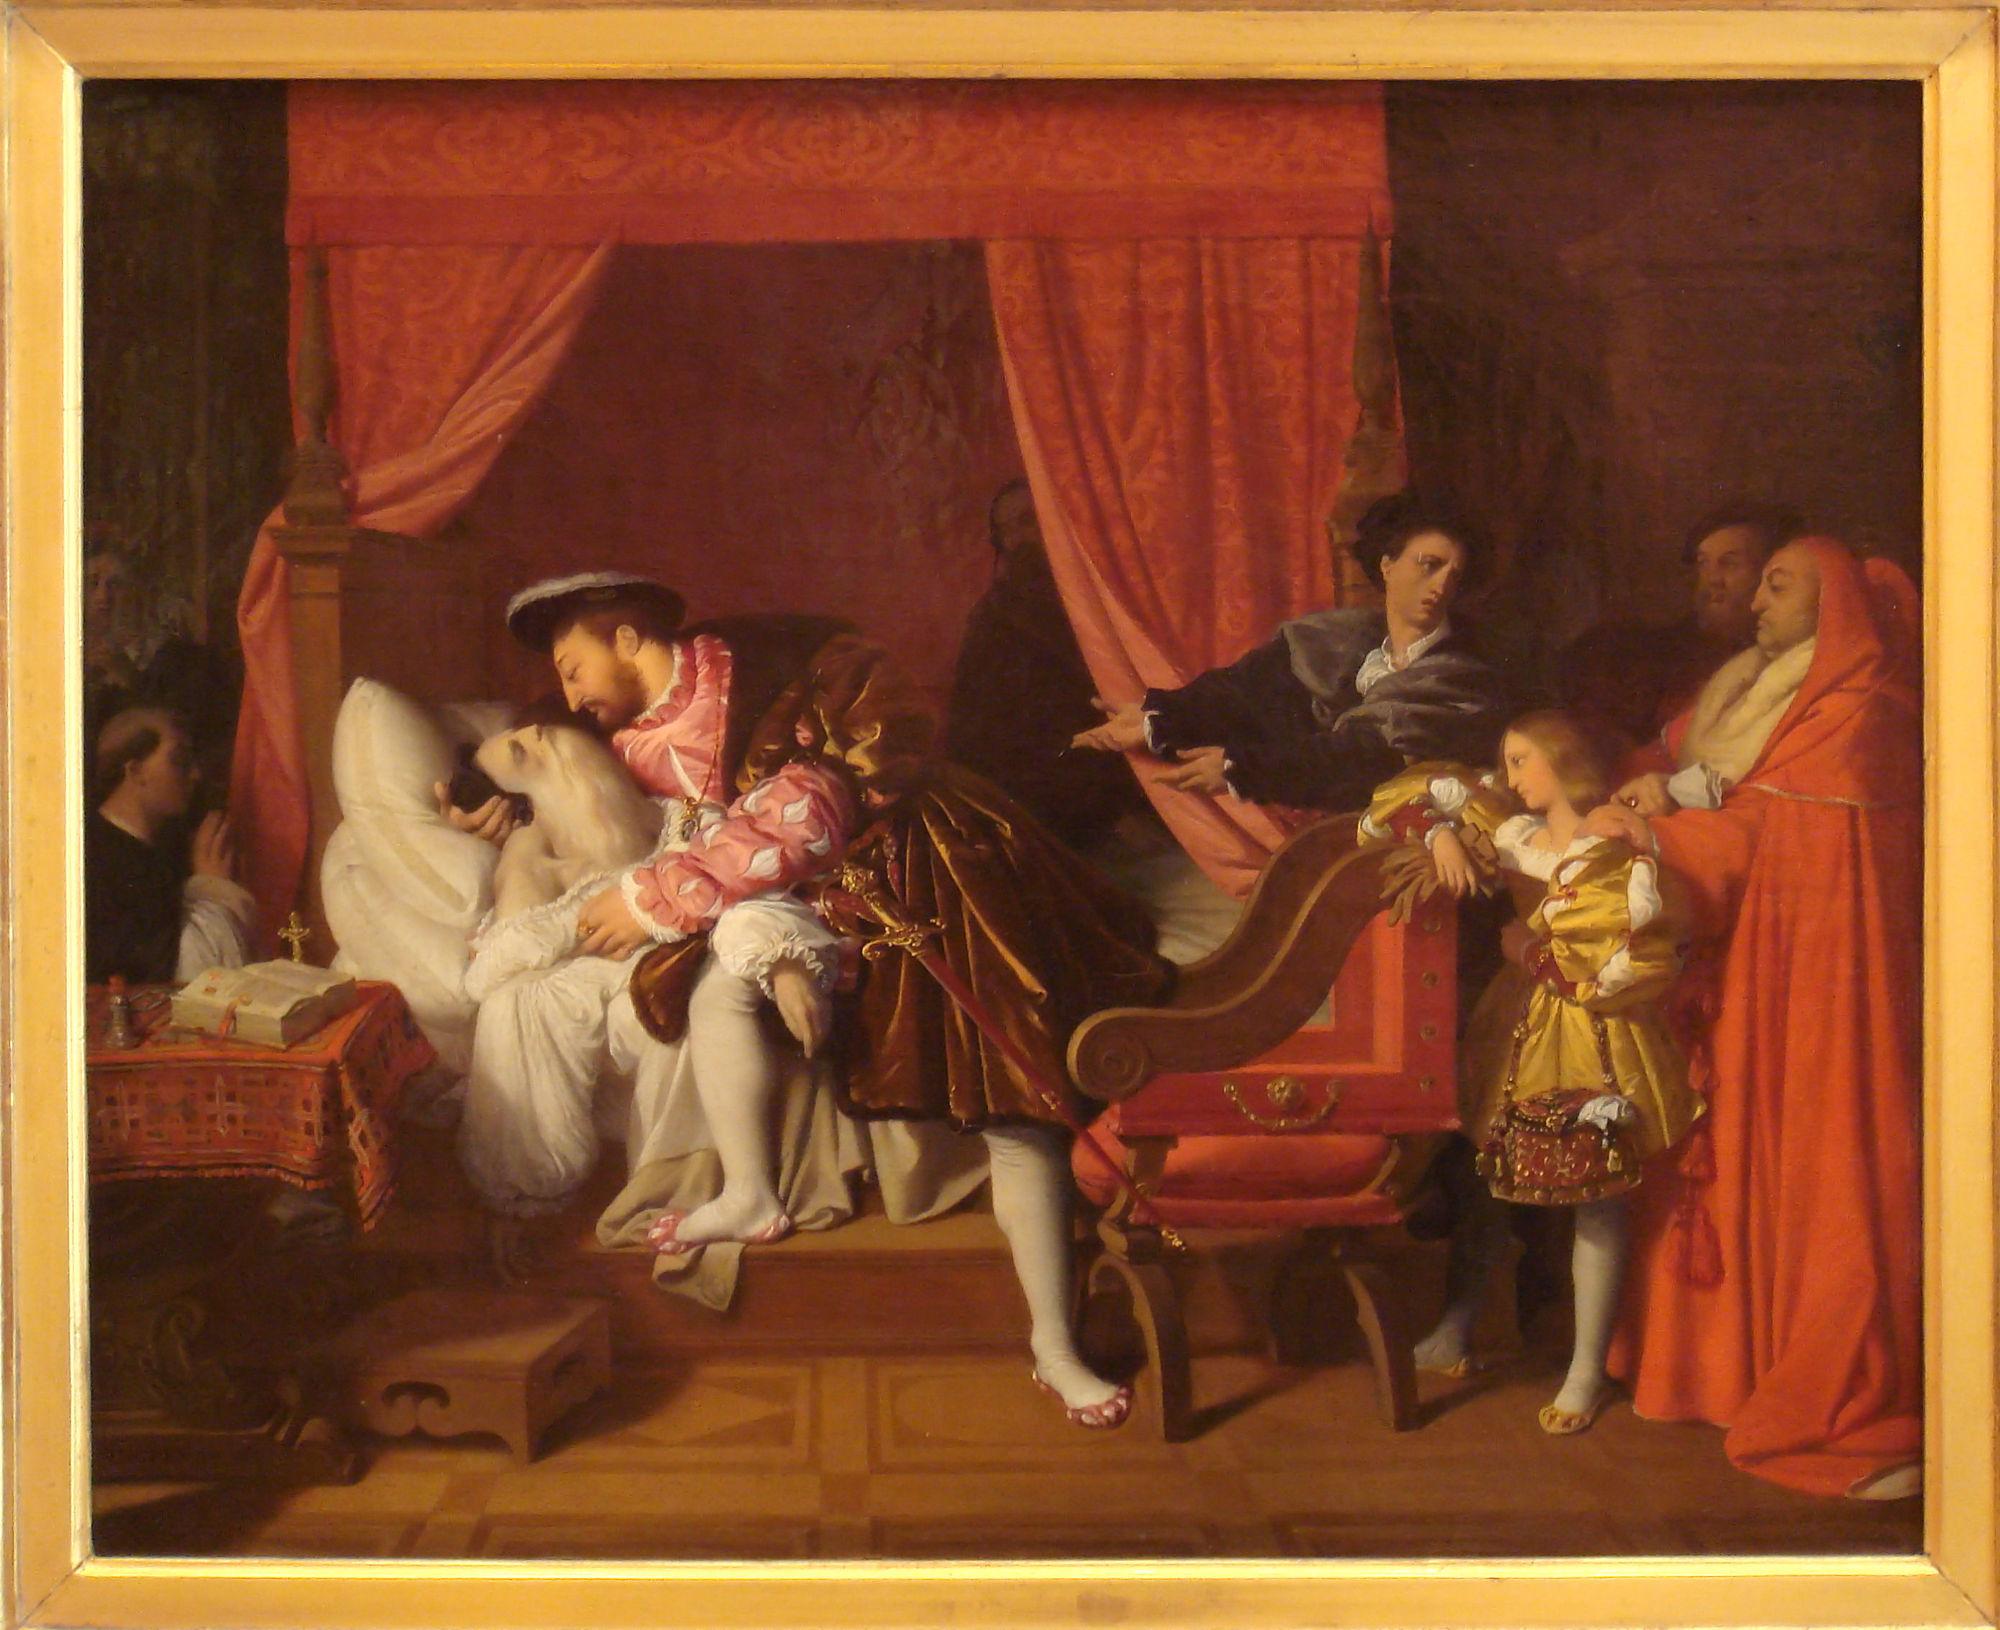 François 1er et Leonard de Vinci